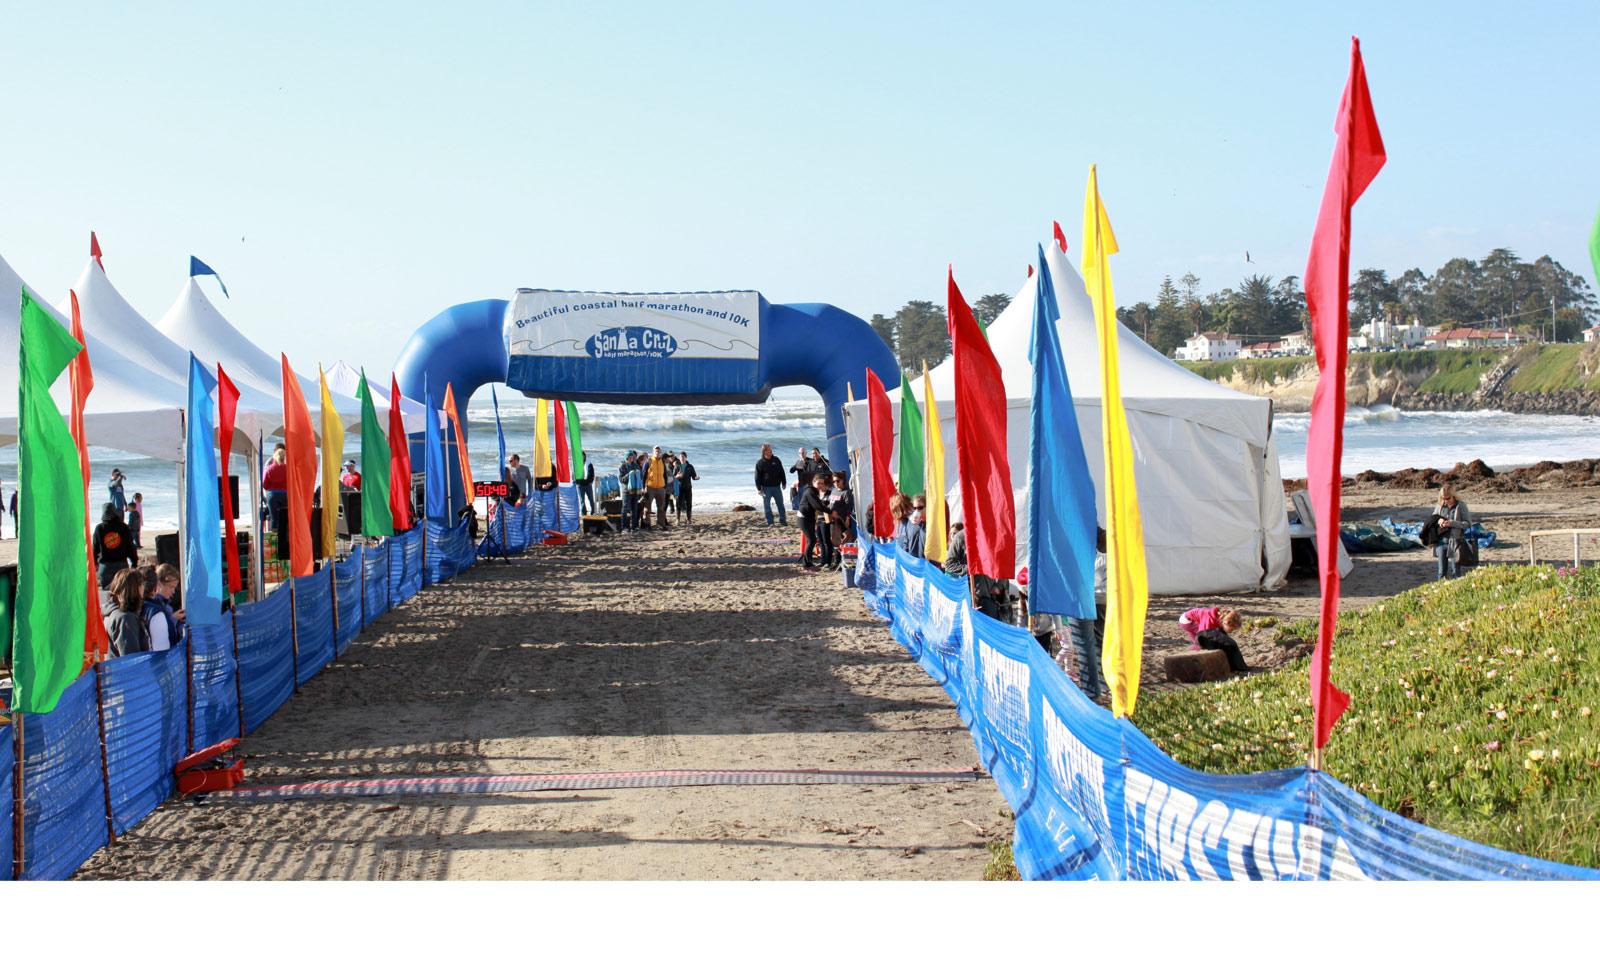 Image result for santa cruz half marathon clipart